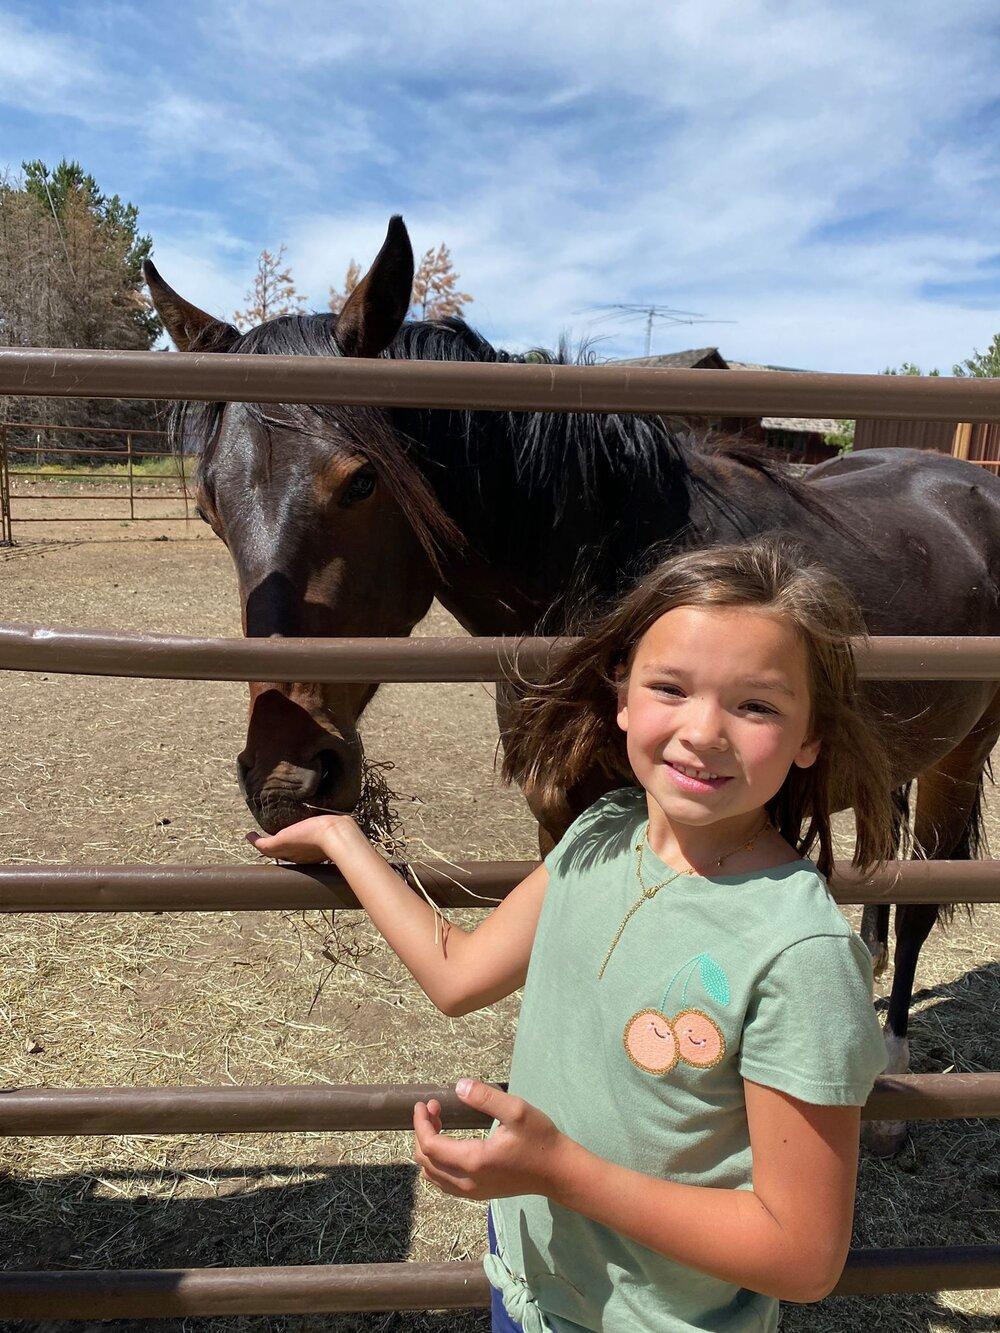 evee and horse.jpg